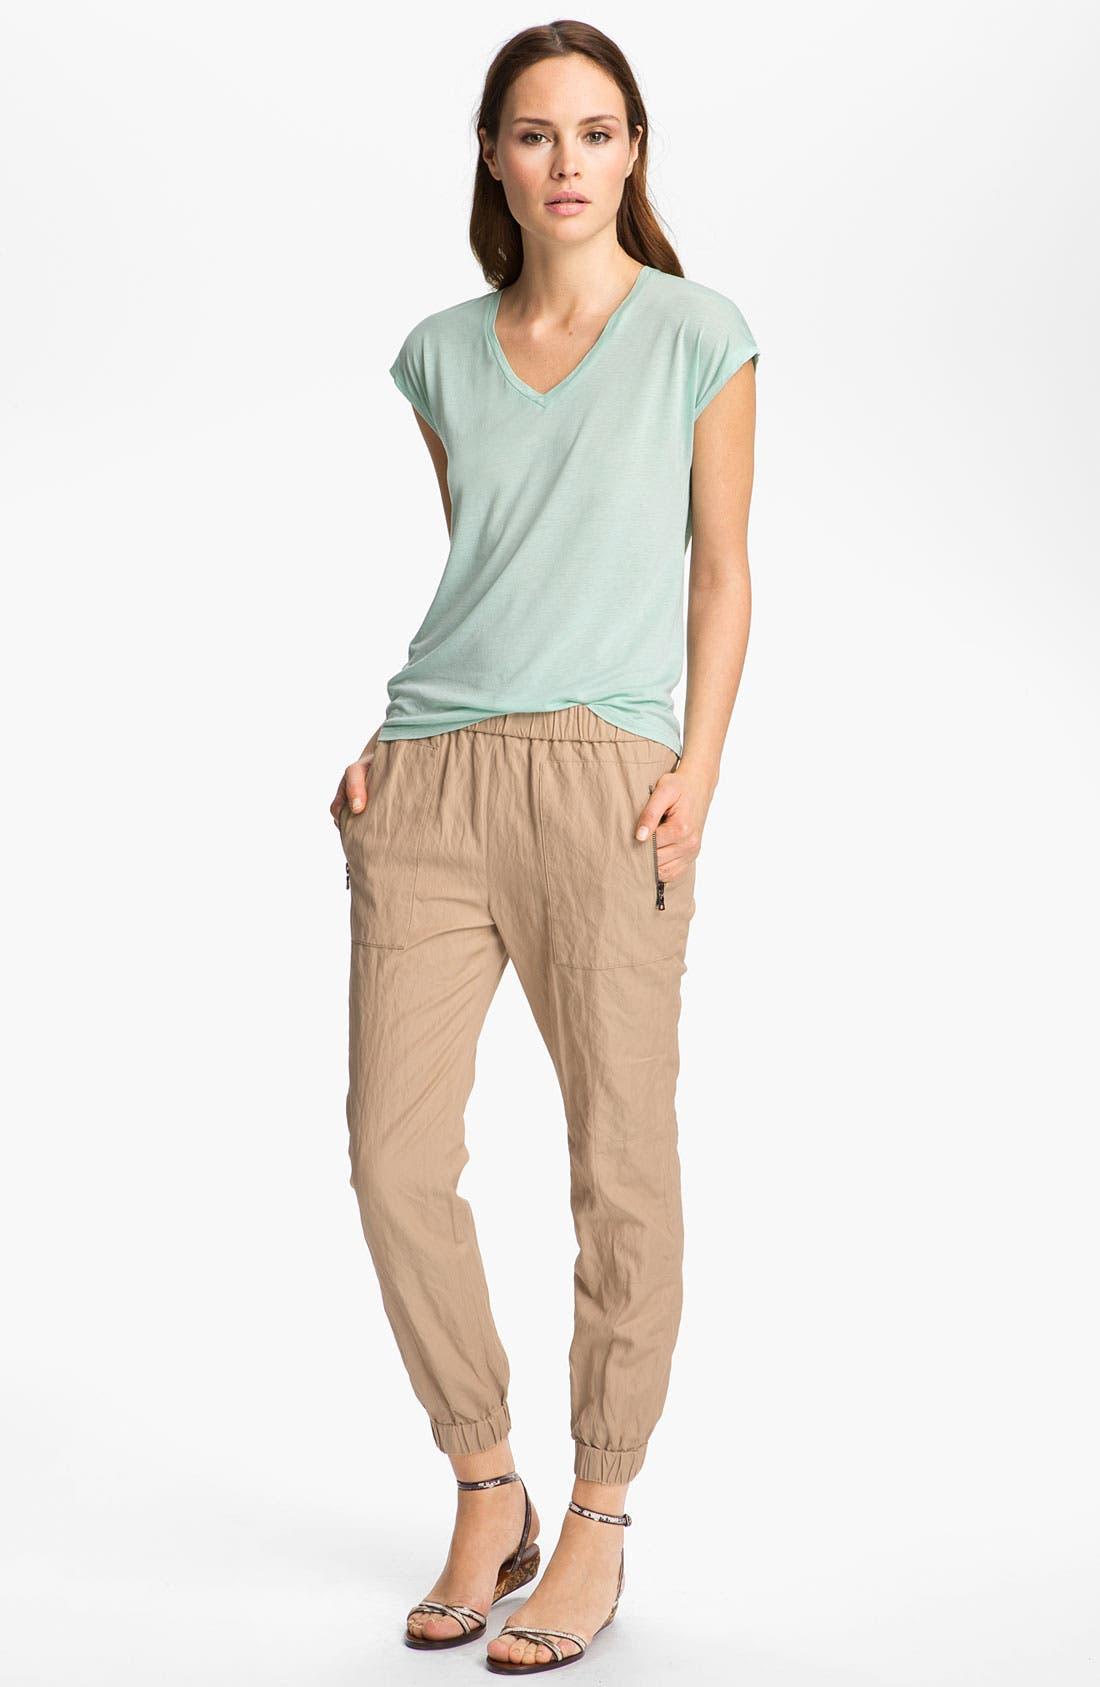 Main Image - J Brand Ready-to-Wear 'Garland' Tee